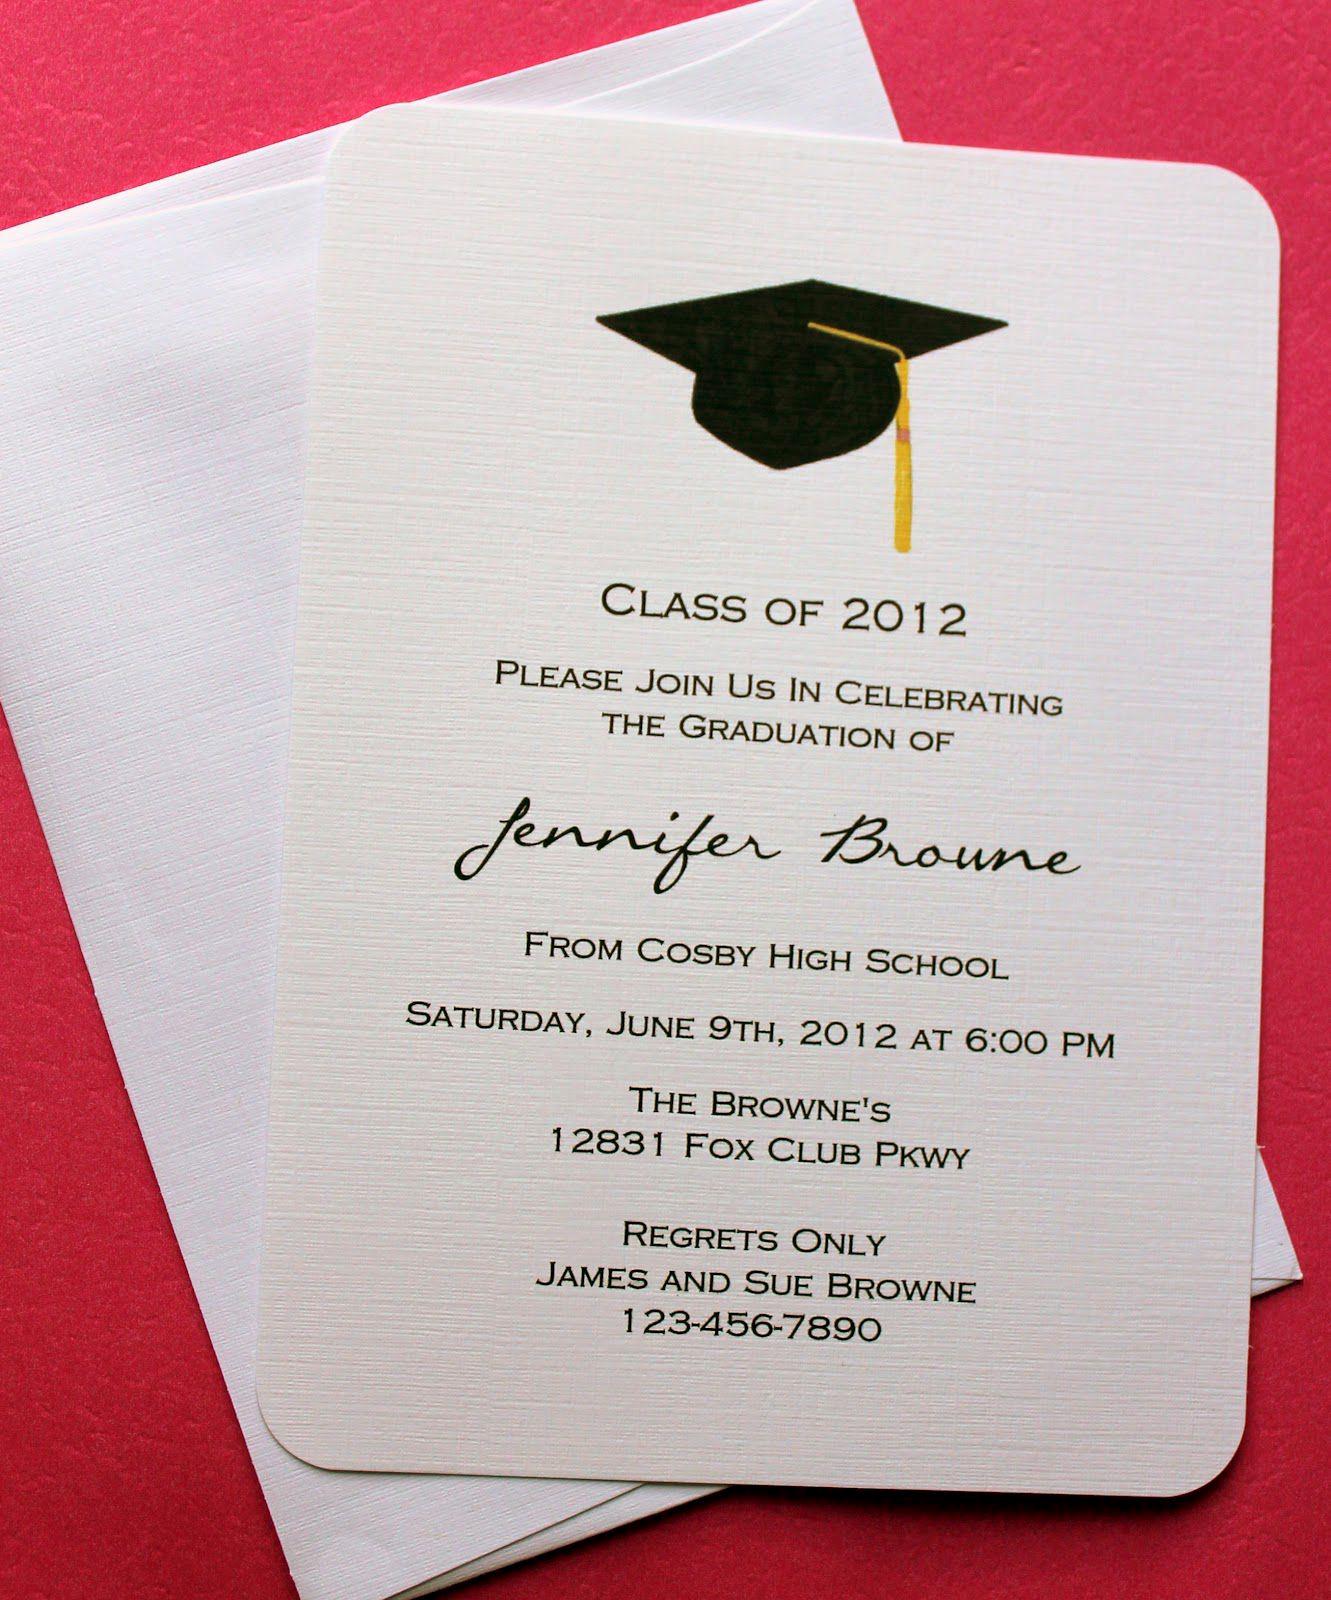 Graduation Invitation Template Free Awesome Graduation Invitation Template Graduation Invitation